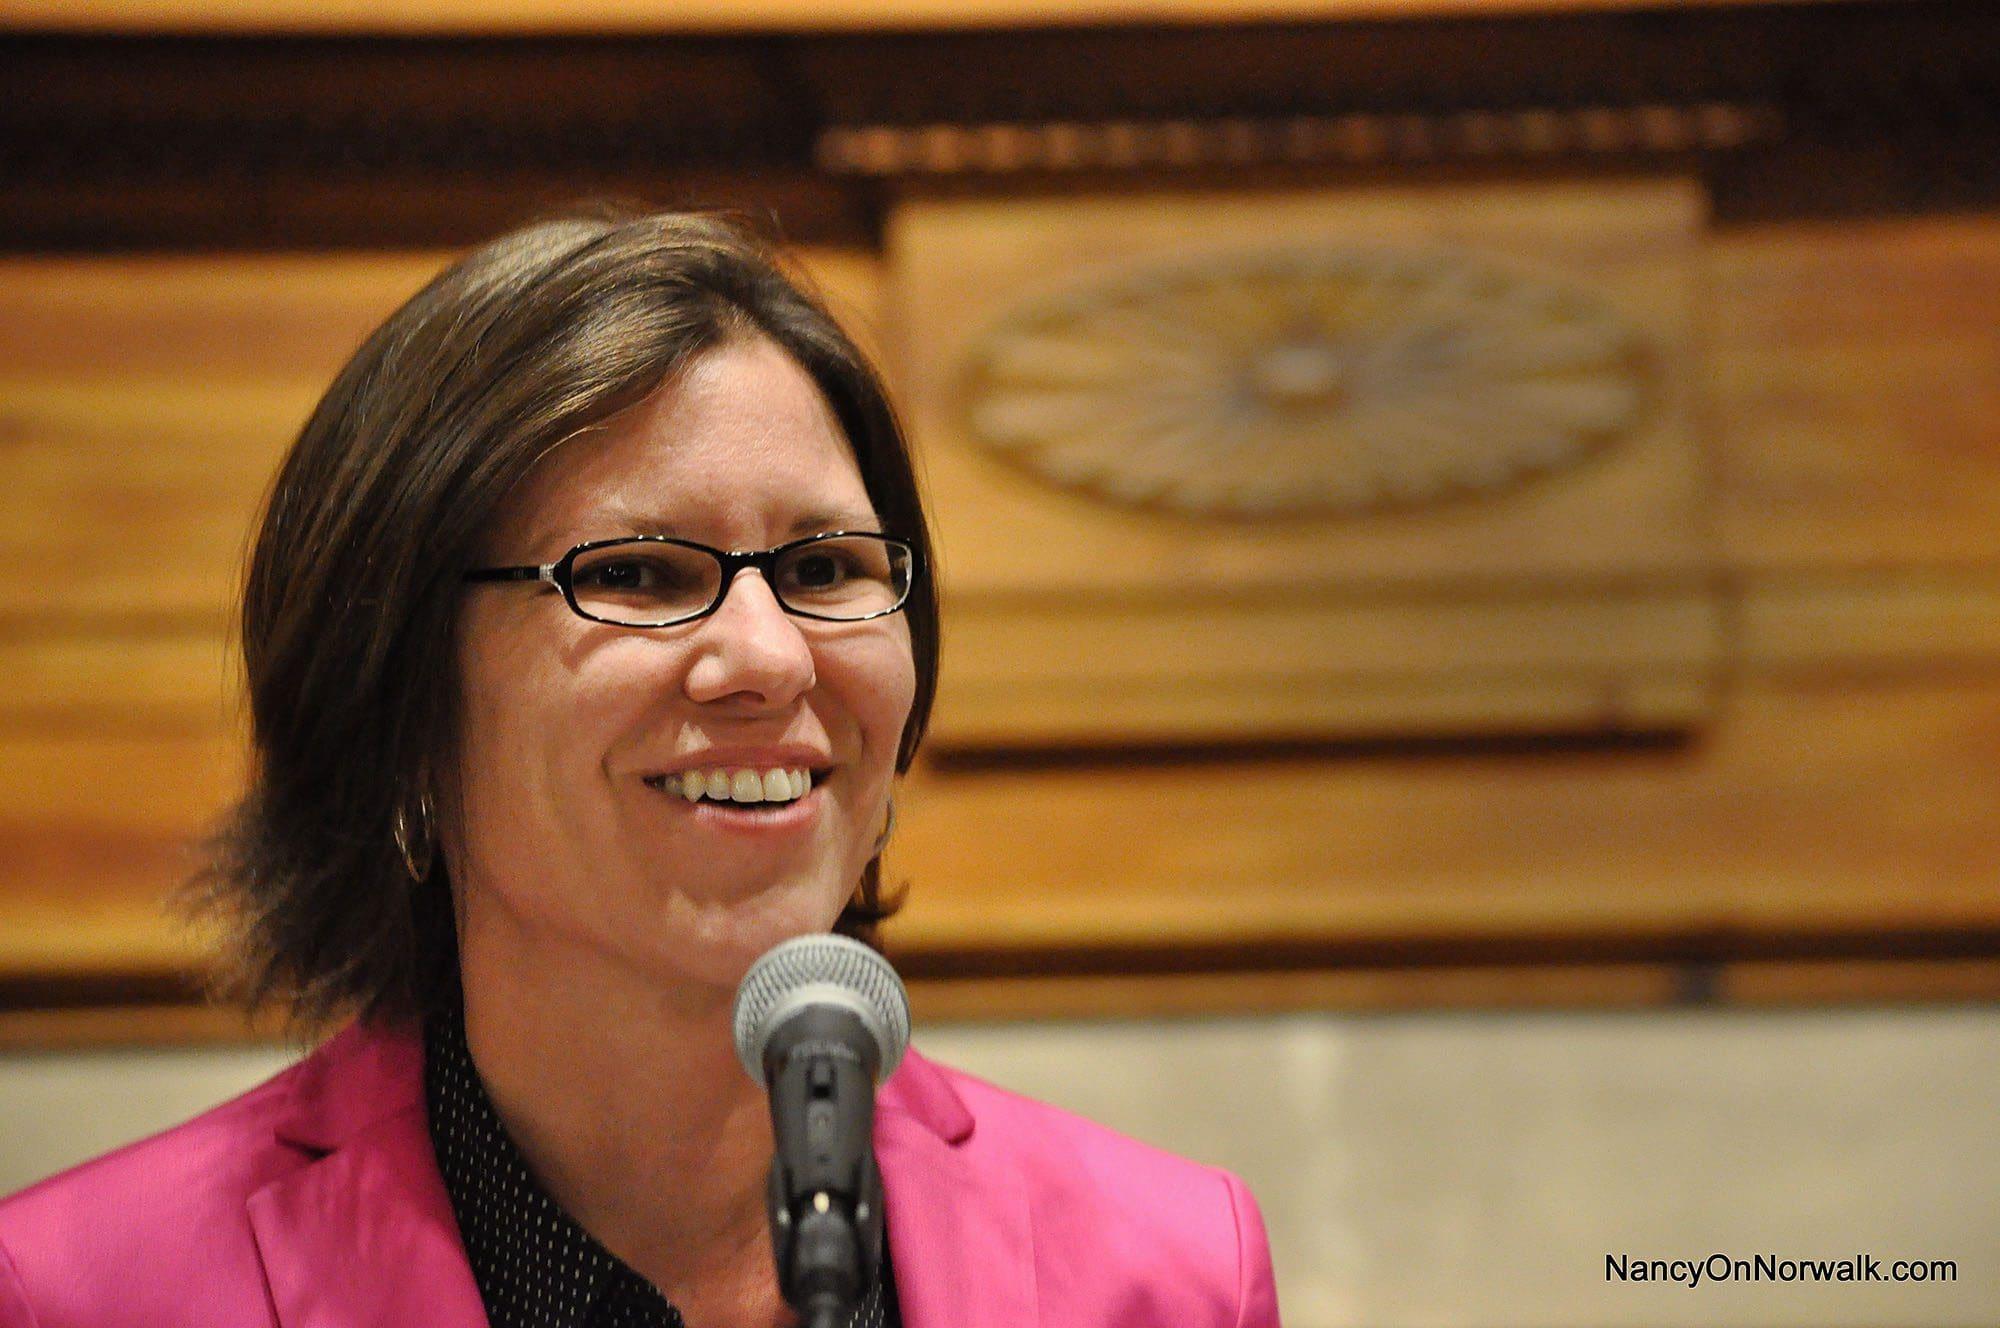 Nancy on Norwalk   News coverage that shines a light on Norwalk, CT ...